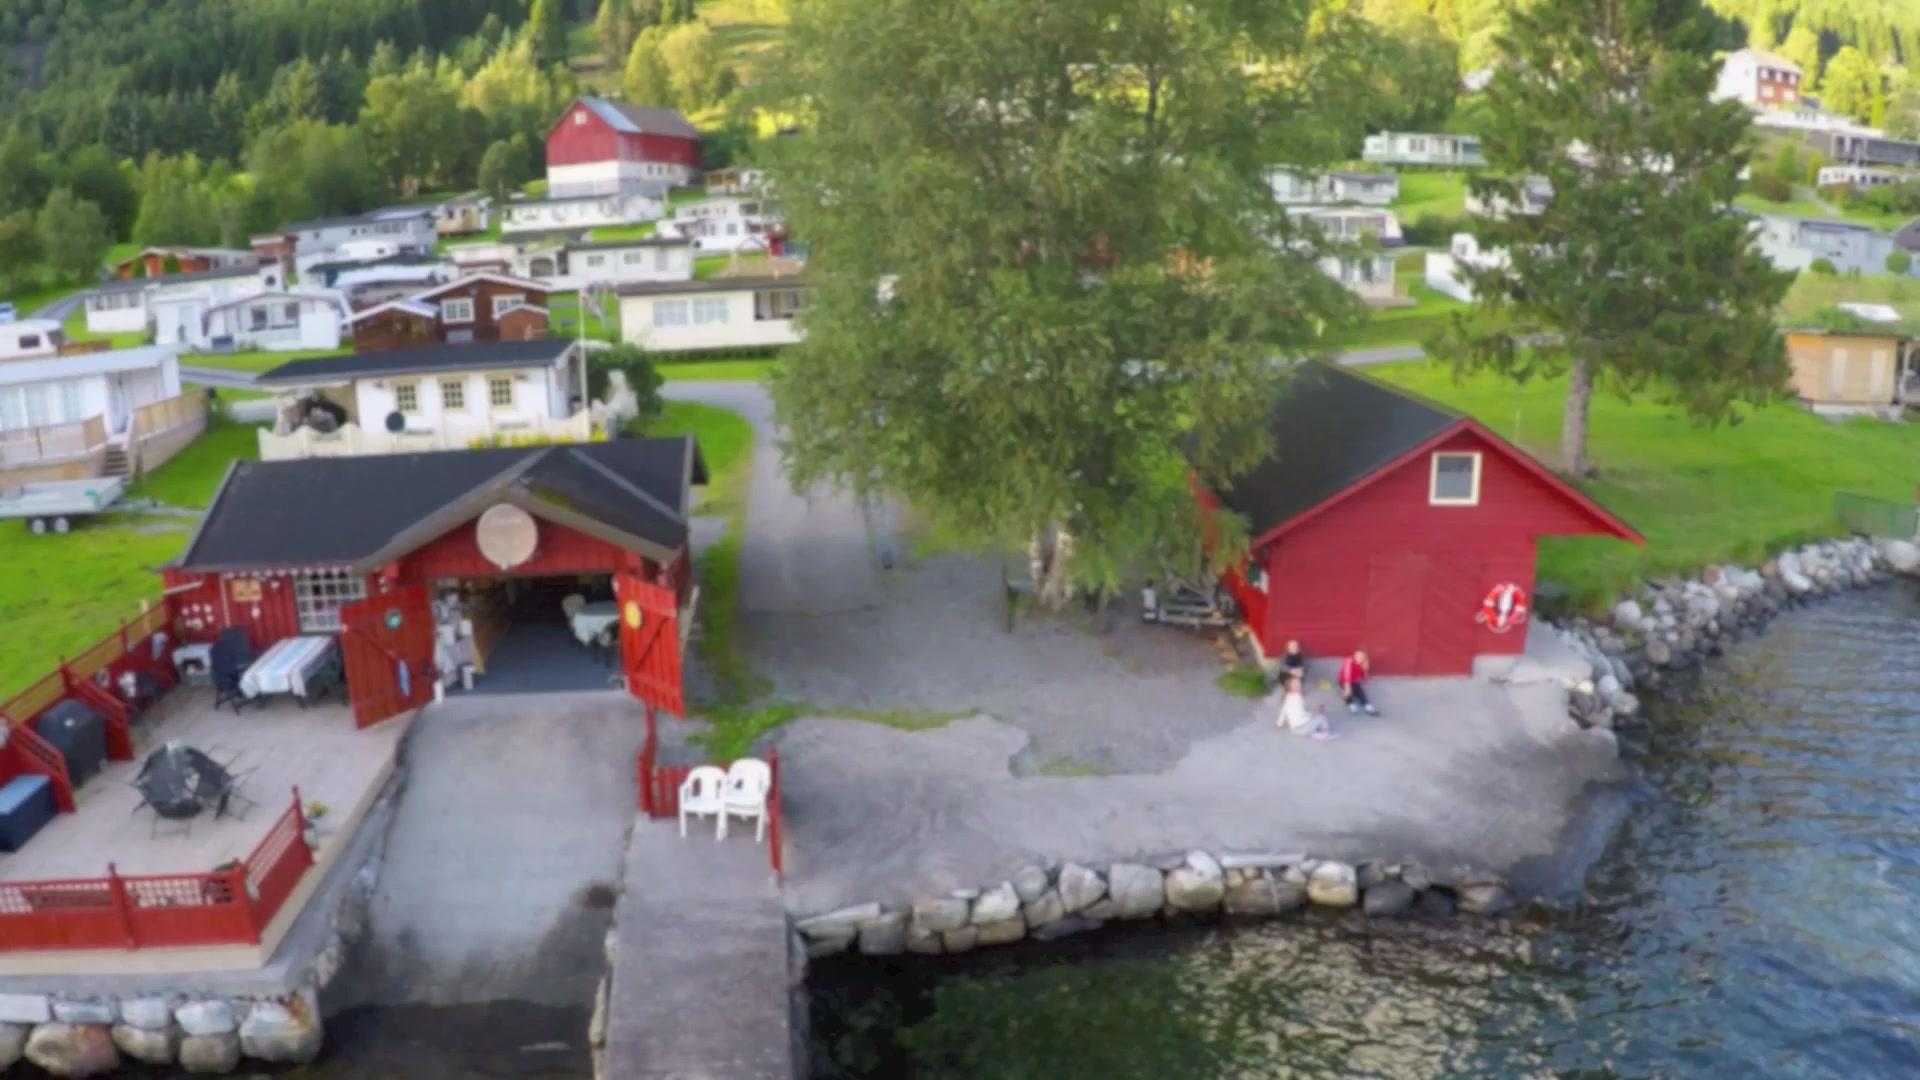 Aurstad Camping